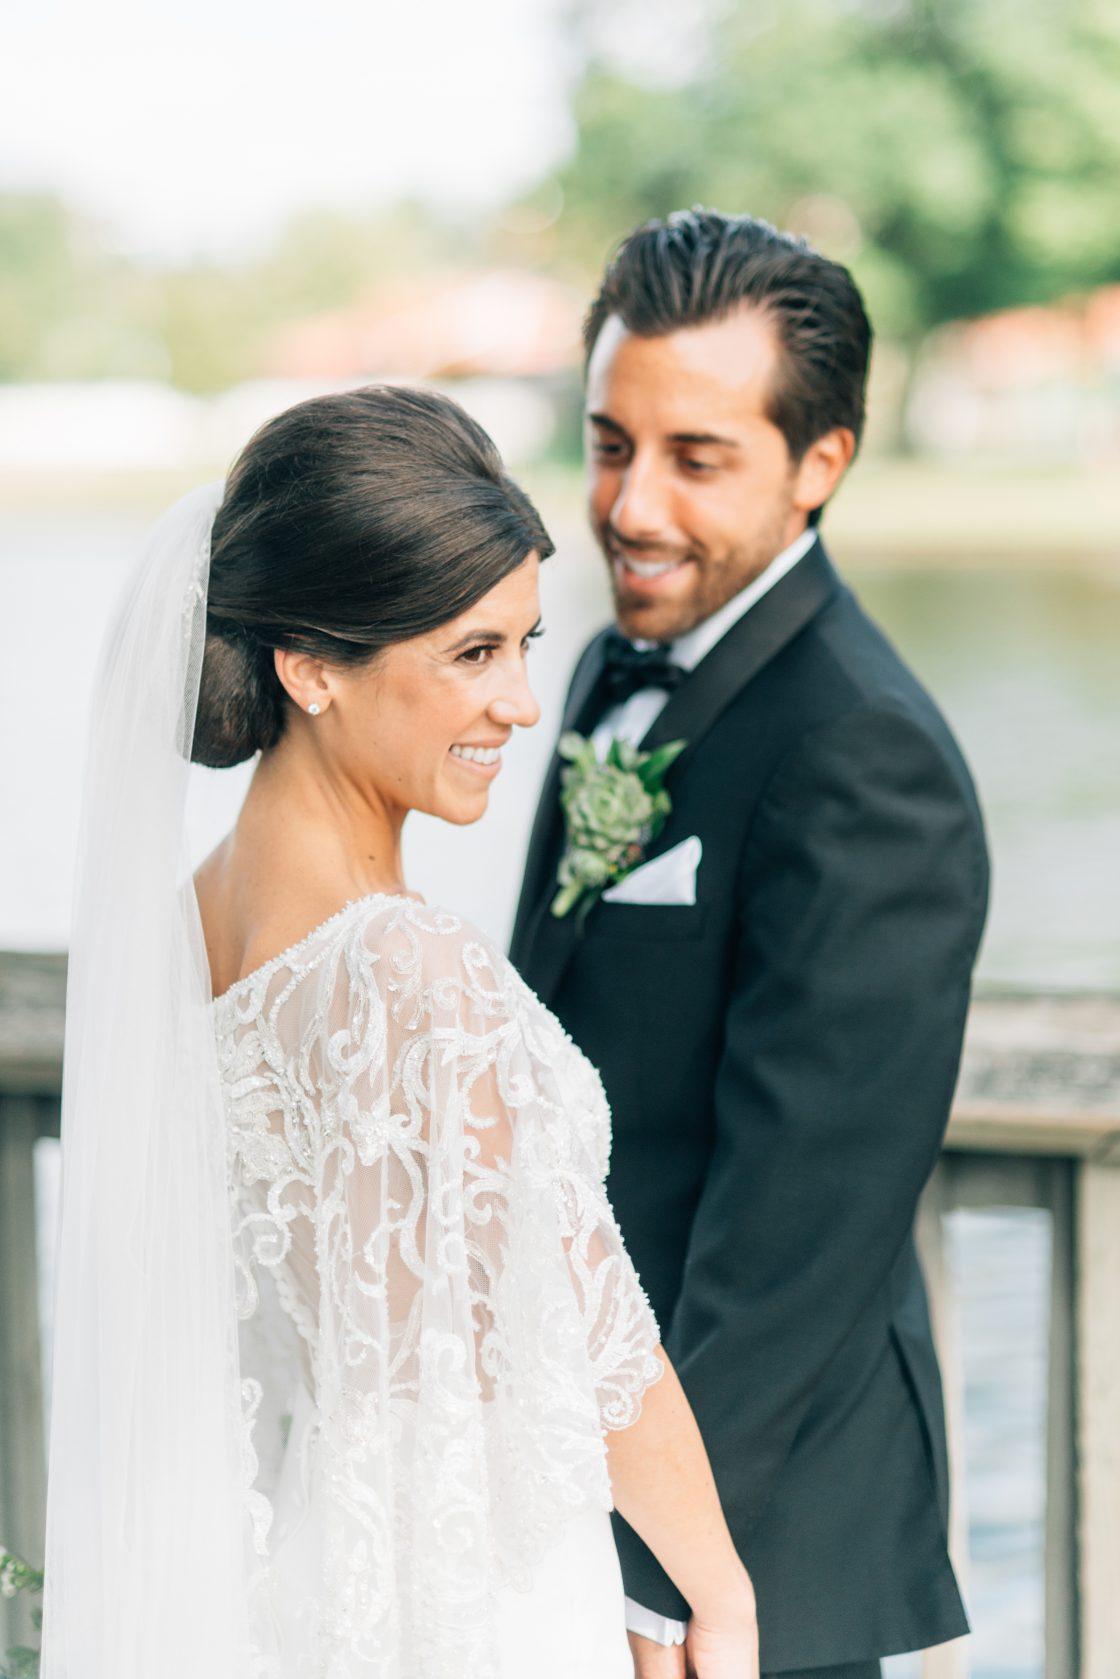 Elegant New Jersey Wedding with Greenery 82